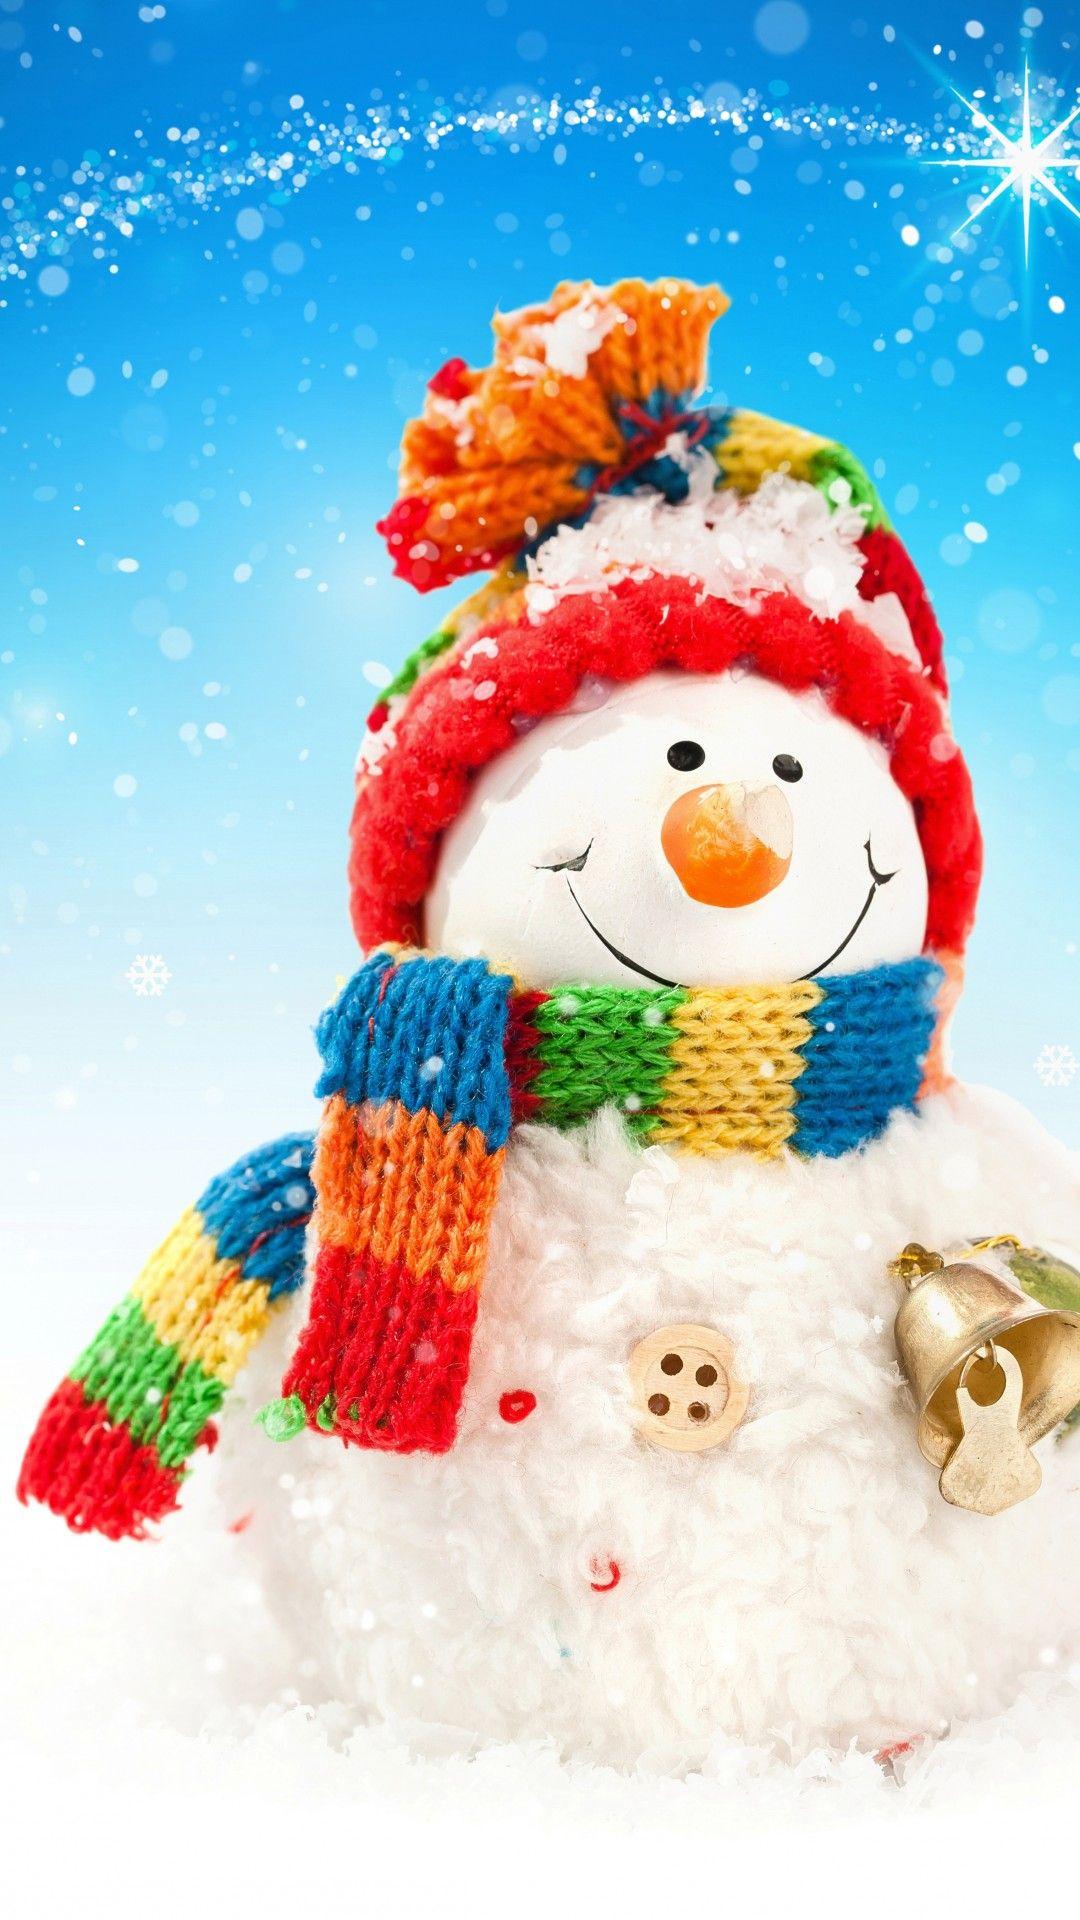 35 Best Christmas iPhone Wallpapers 2019 Snowman